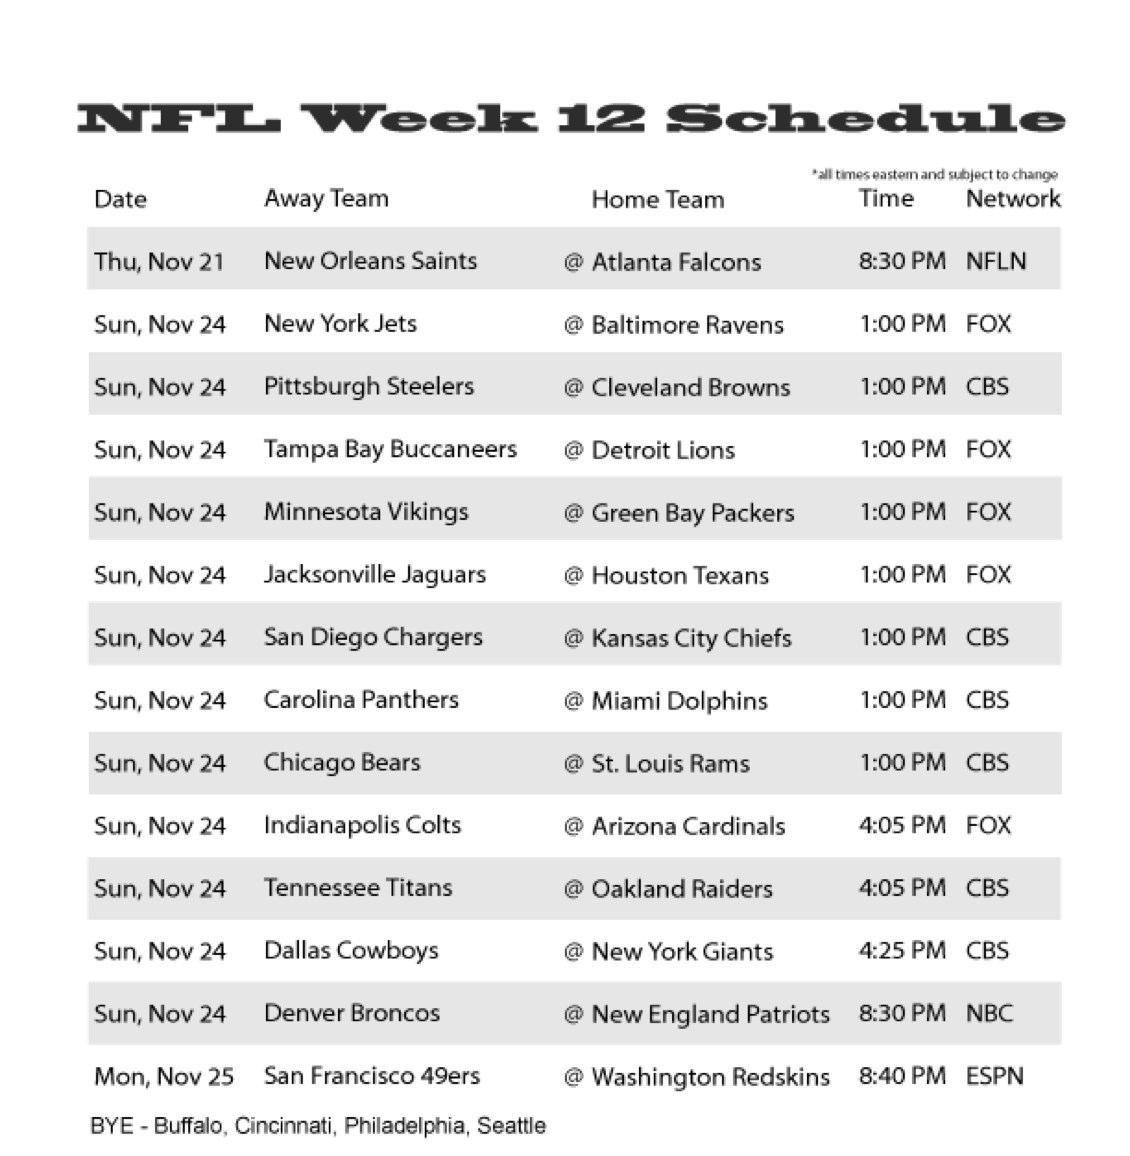 Nfl week 12 schedule 2013